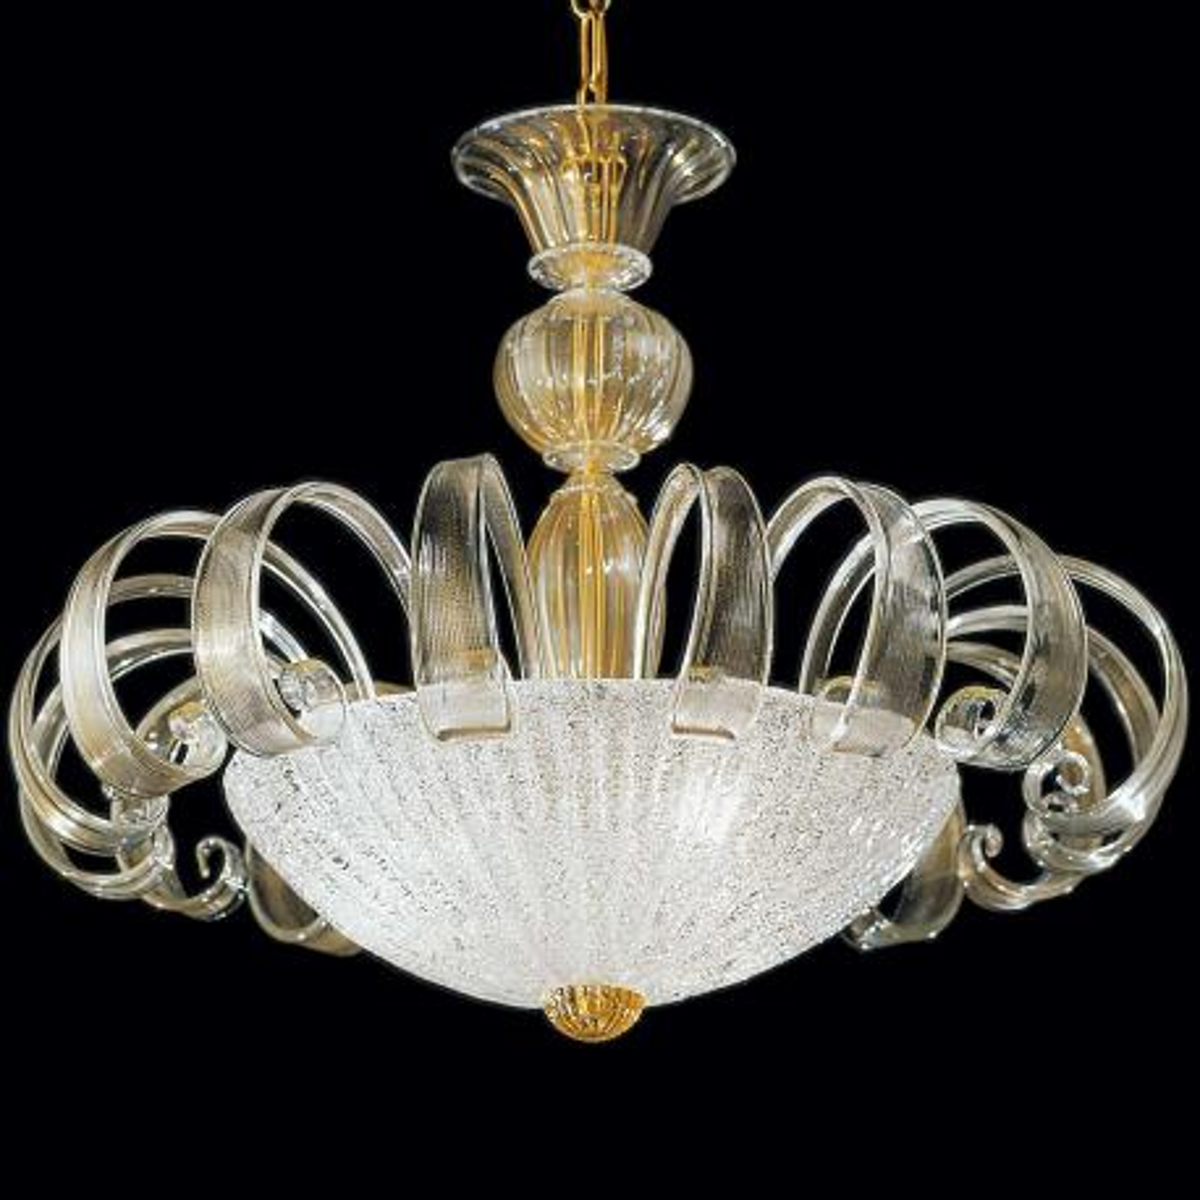 """Ipparchia"" lampara de araña de Murano - 3 luces - transparent y oro"